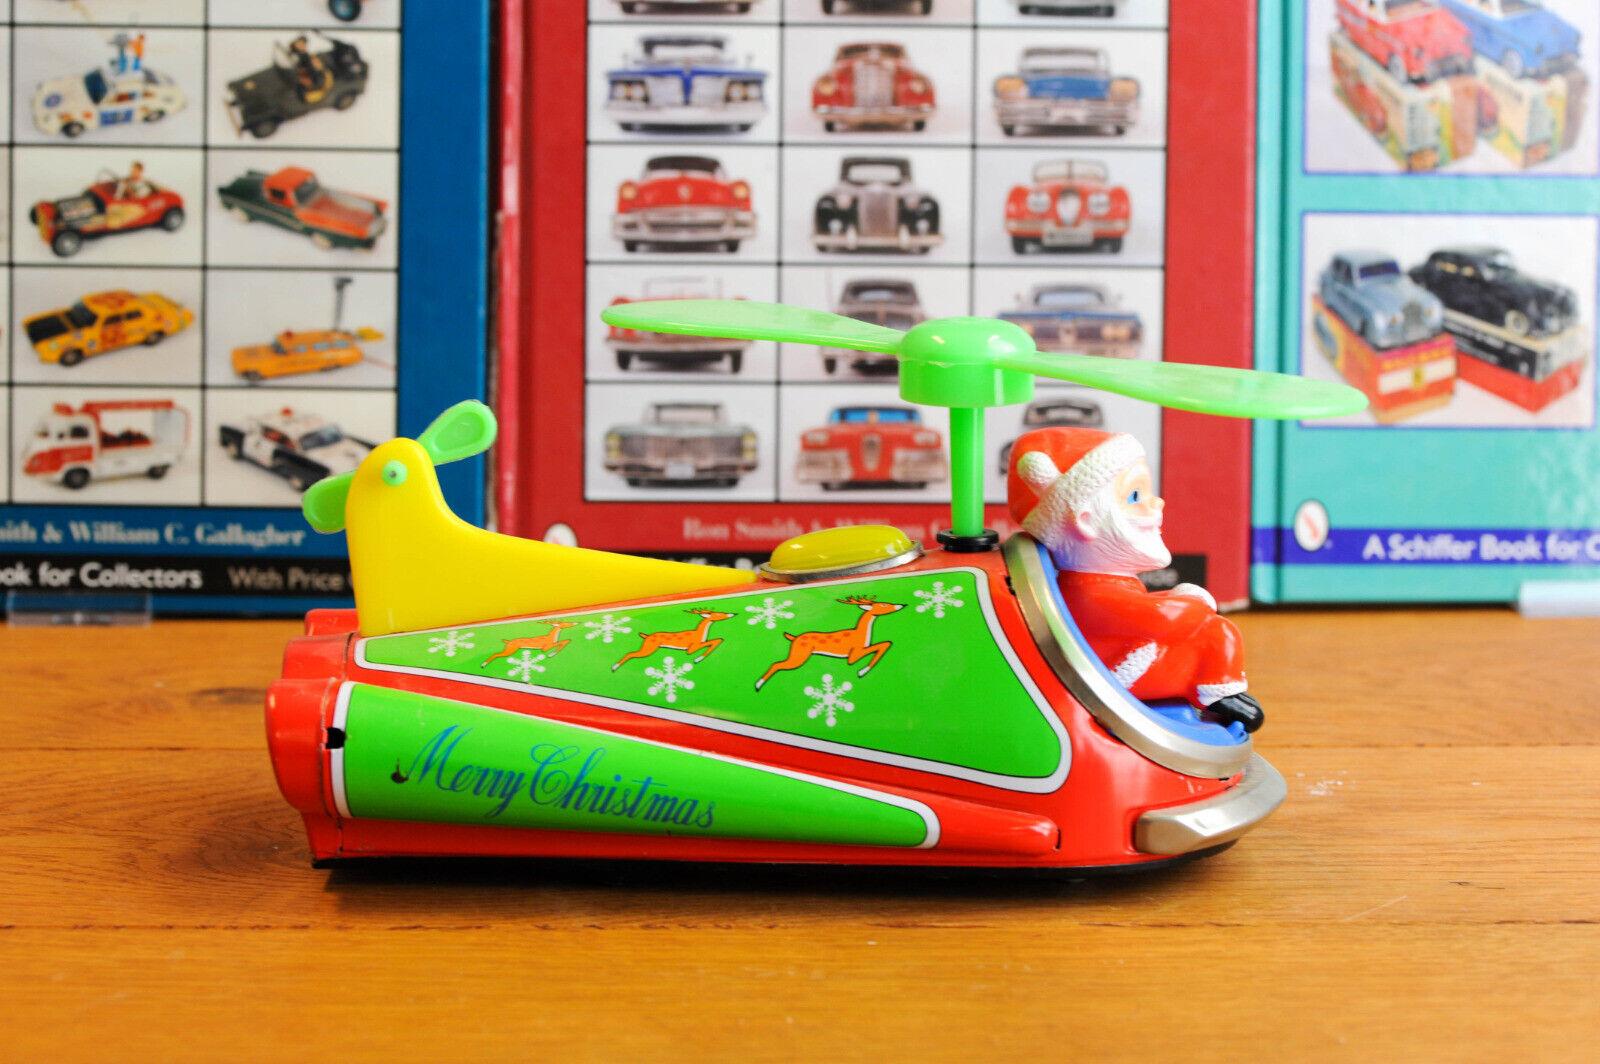 _AntiqueTin leksakMasudaya japan Space Ship Tin leksak Santa Copter lådaed arbetssätt Herregud